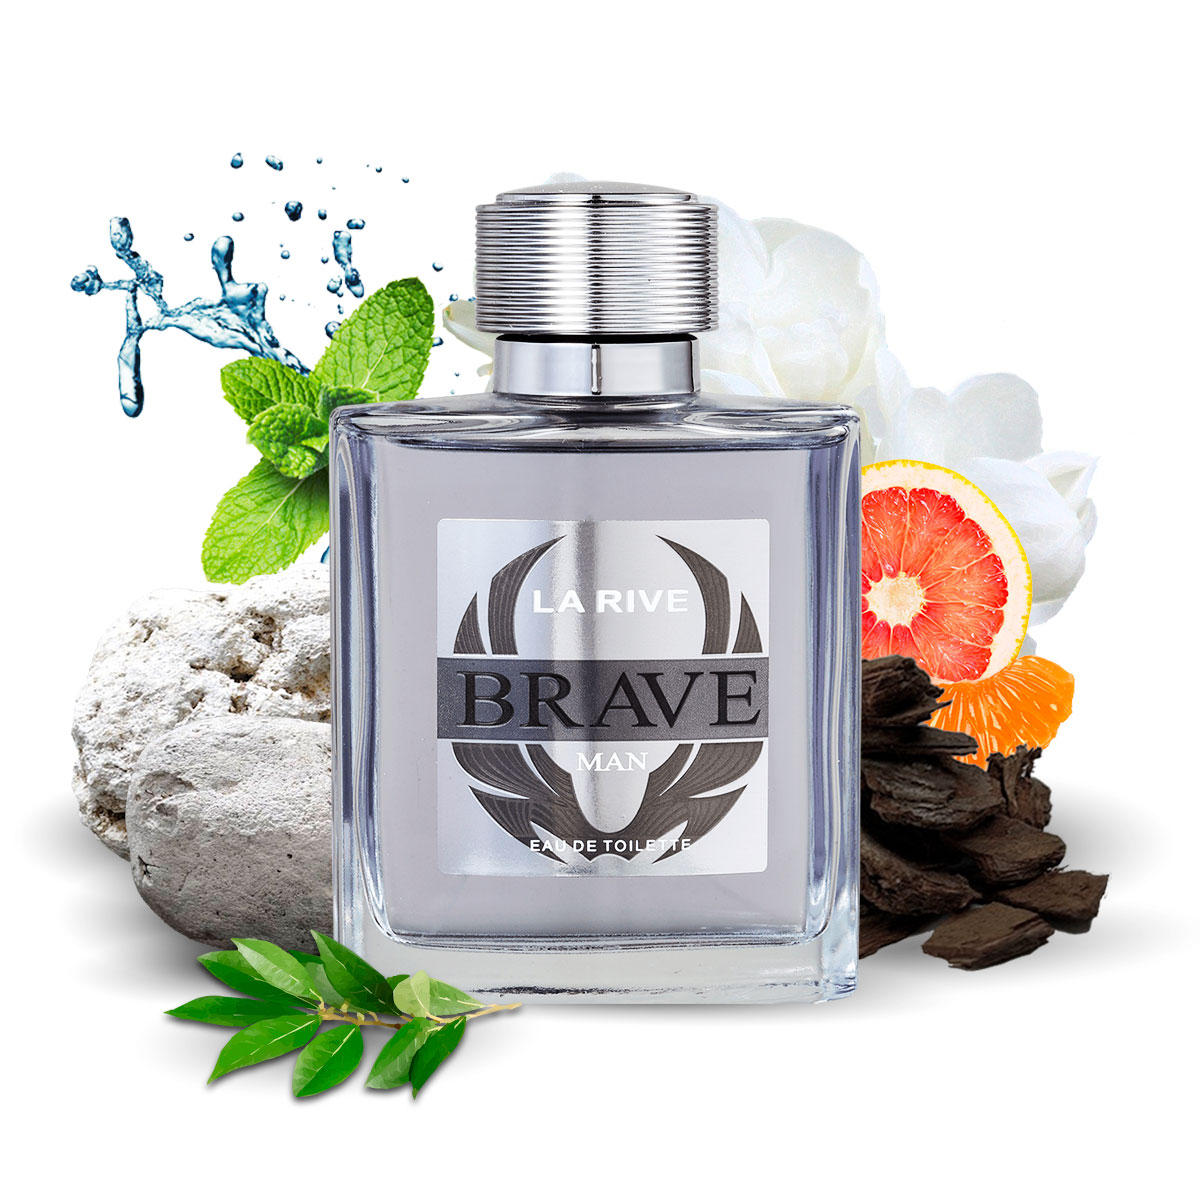 Kit 2 Perfumes Importados Brave e Touch of Woman La Rive